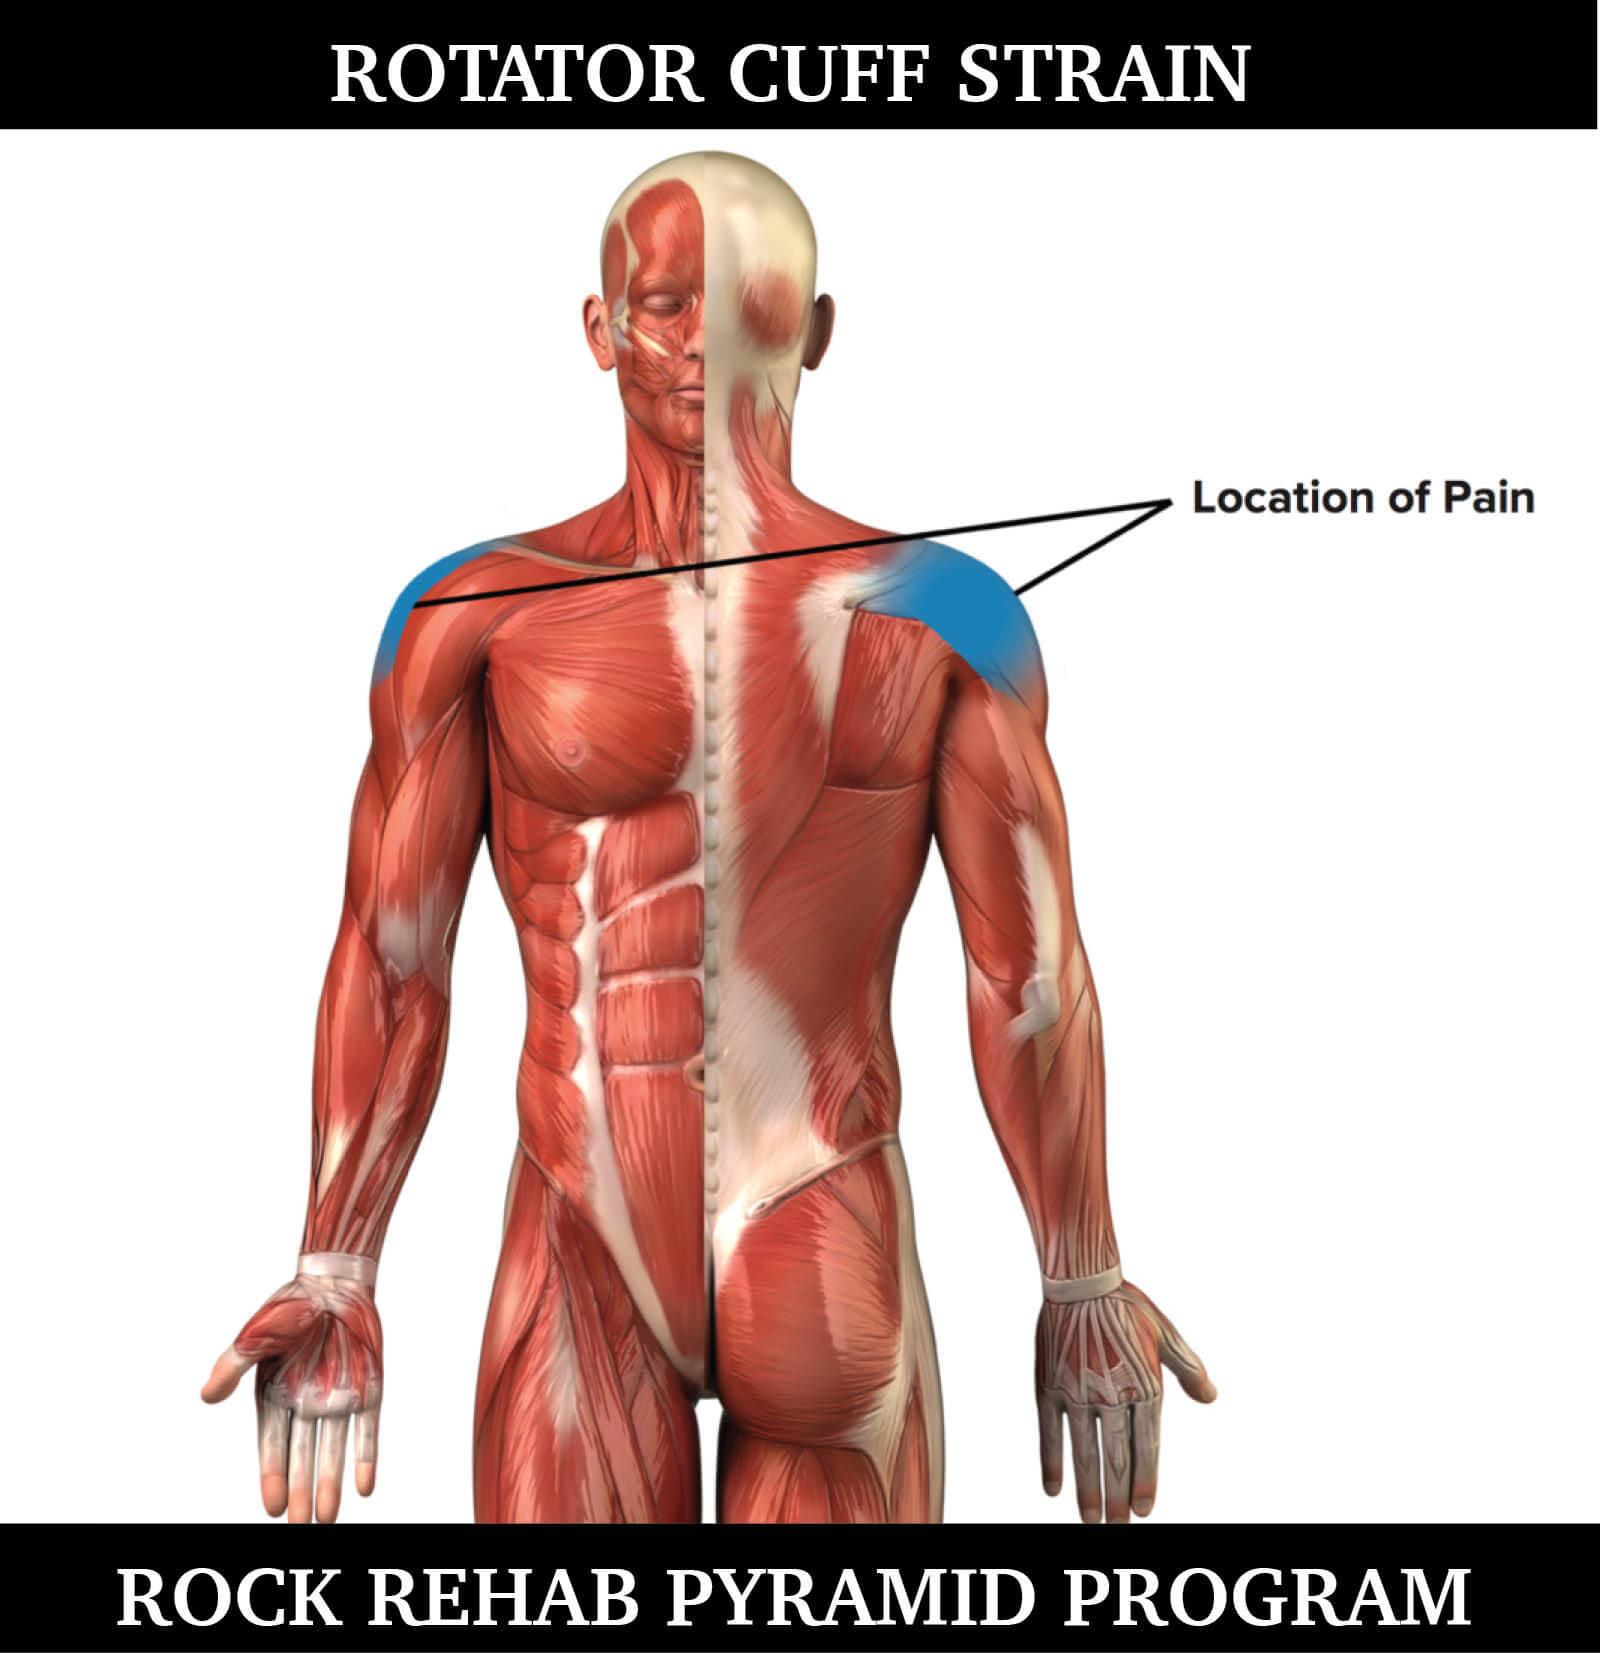 Rock Rehab Pyramid Videos - Training for Rock Climbing